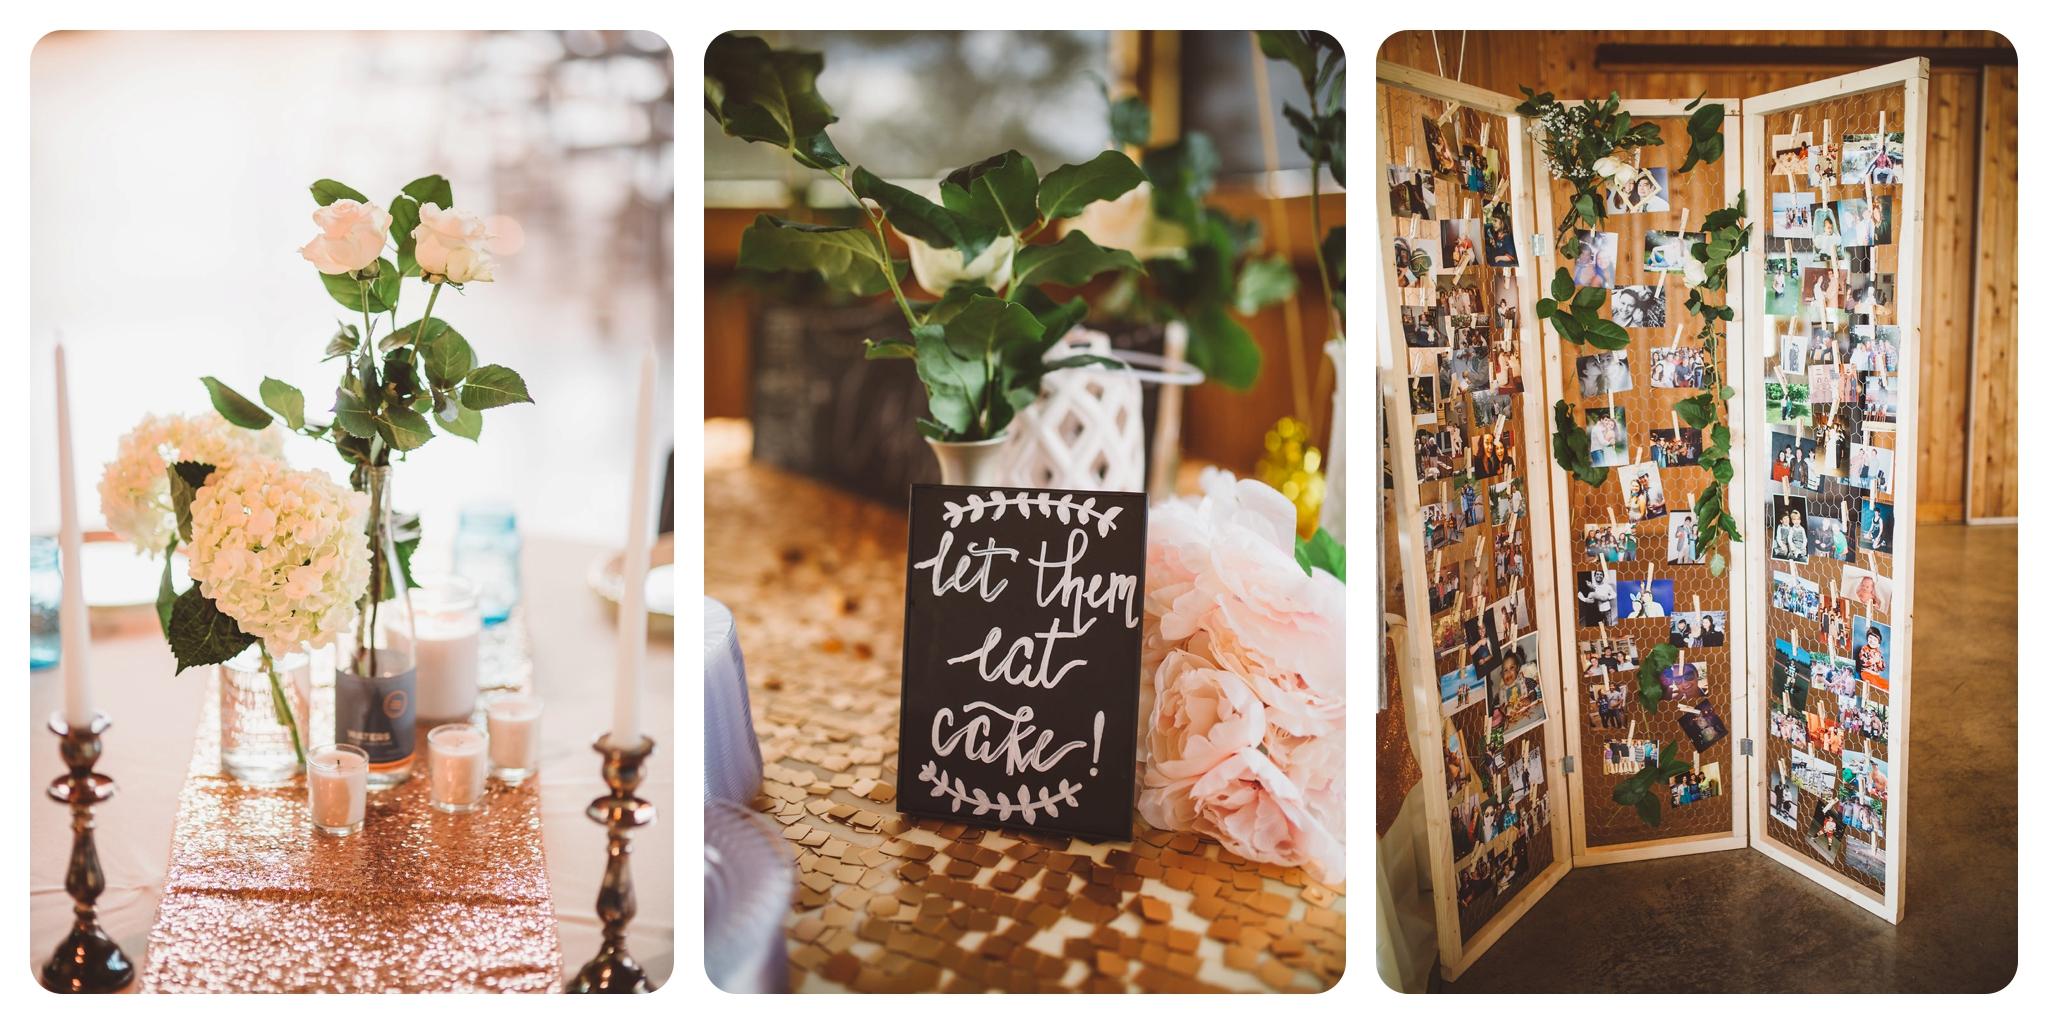 Braeloch-Weddings-Wedding-Photographer-Pat-Cori-Photography-014.jpg